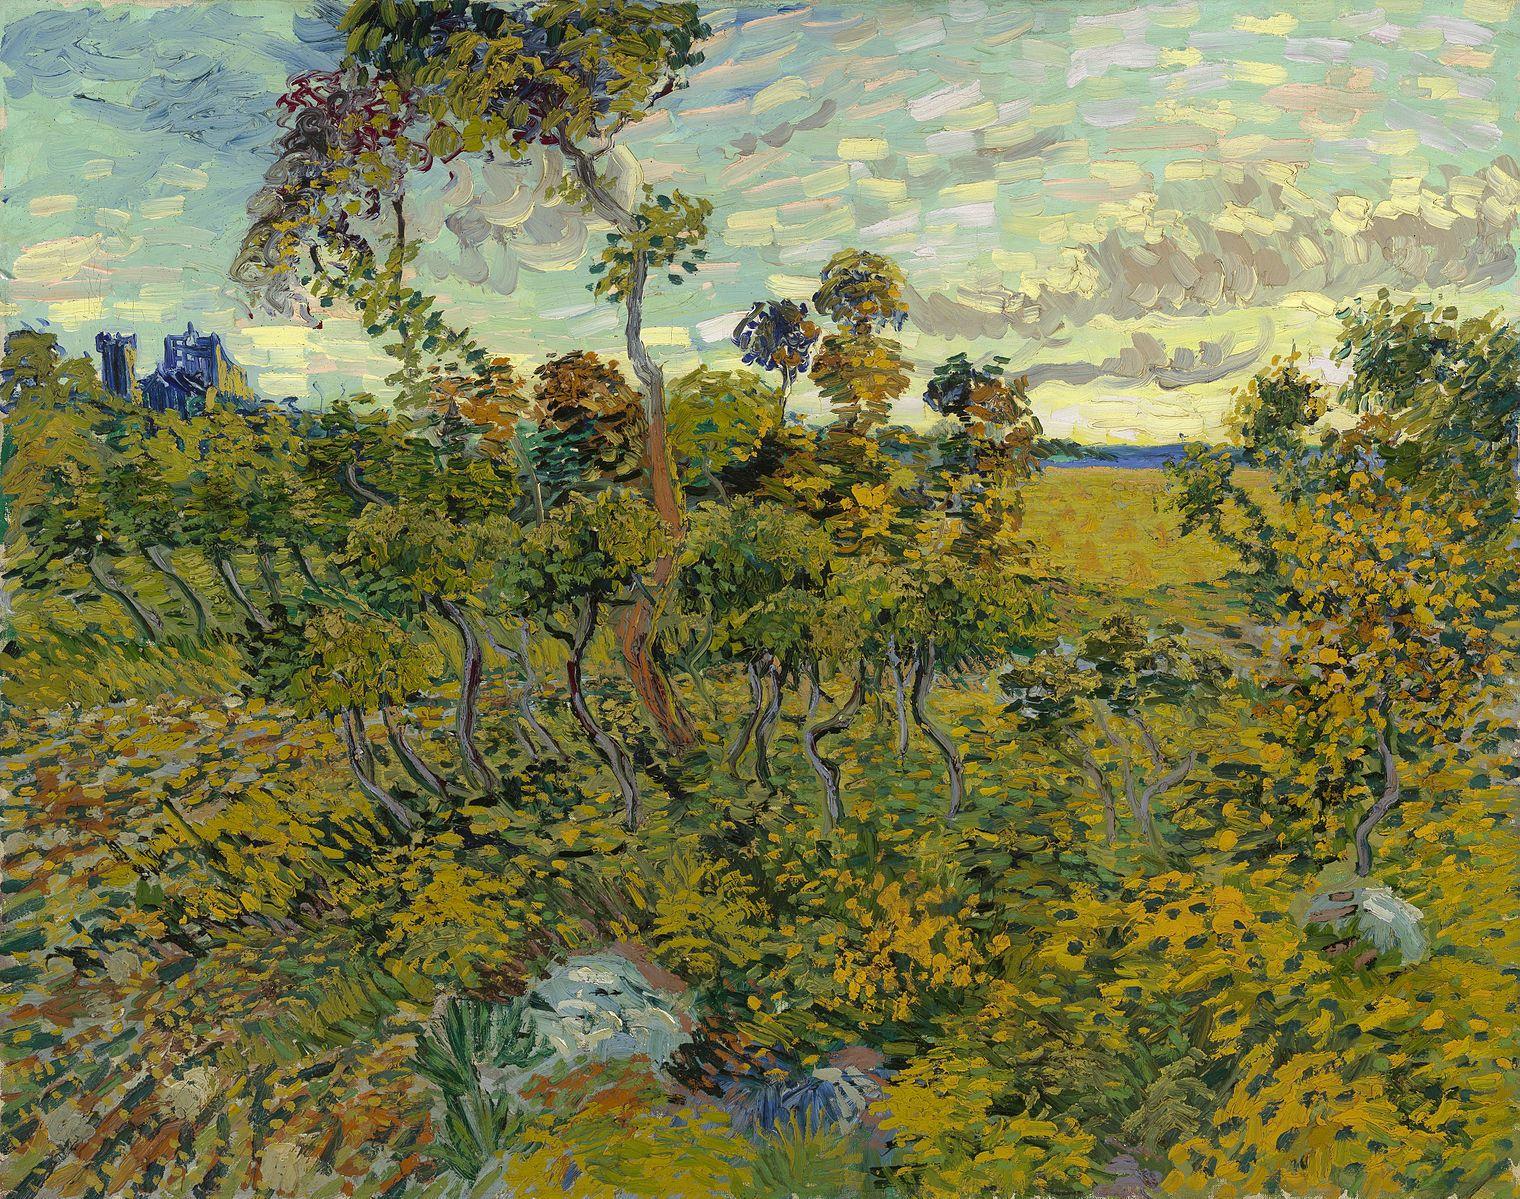 Archivo:Sunset at Montmajour 1888 Van Gogh.jpg